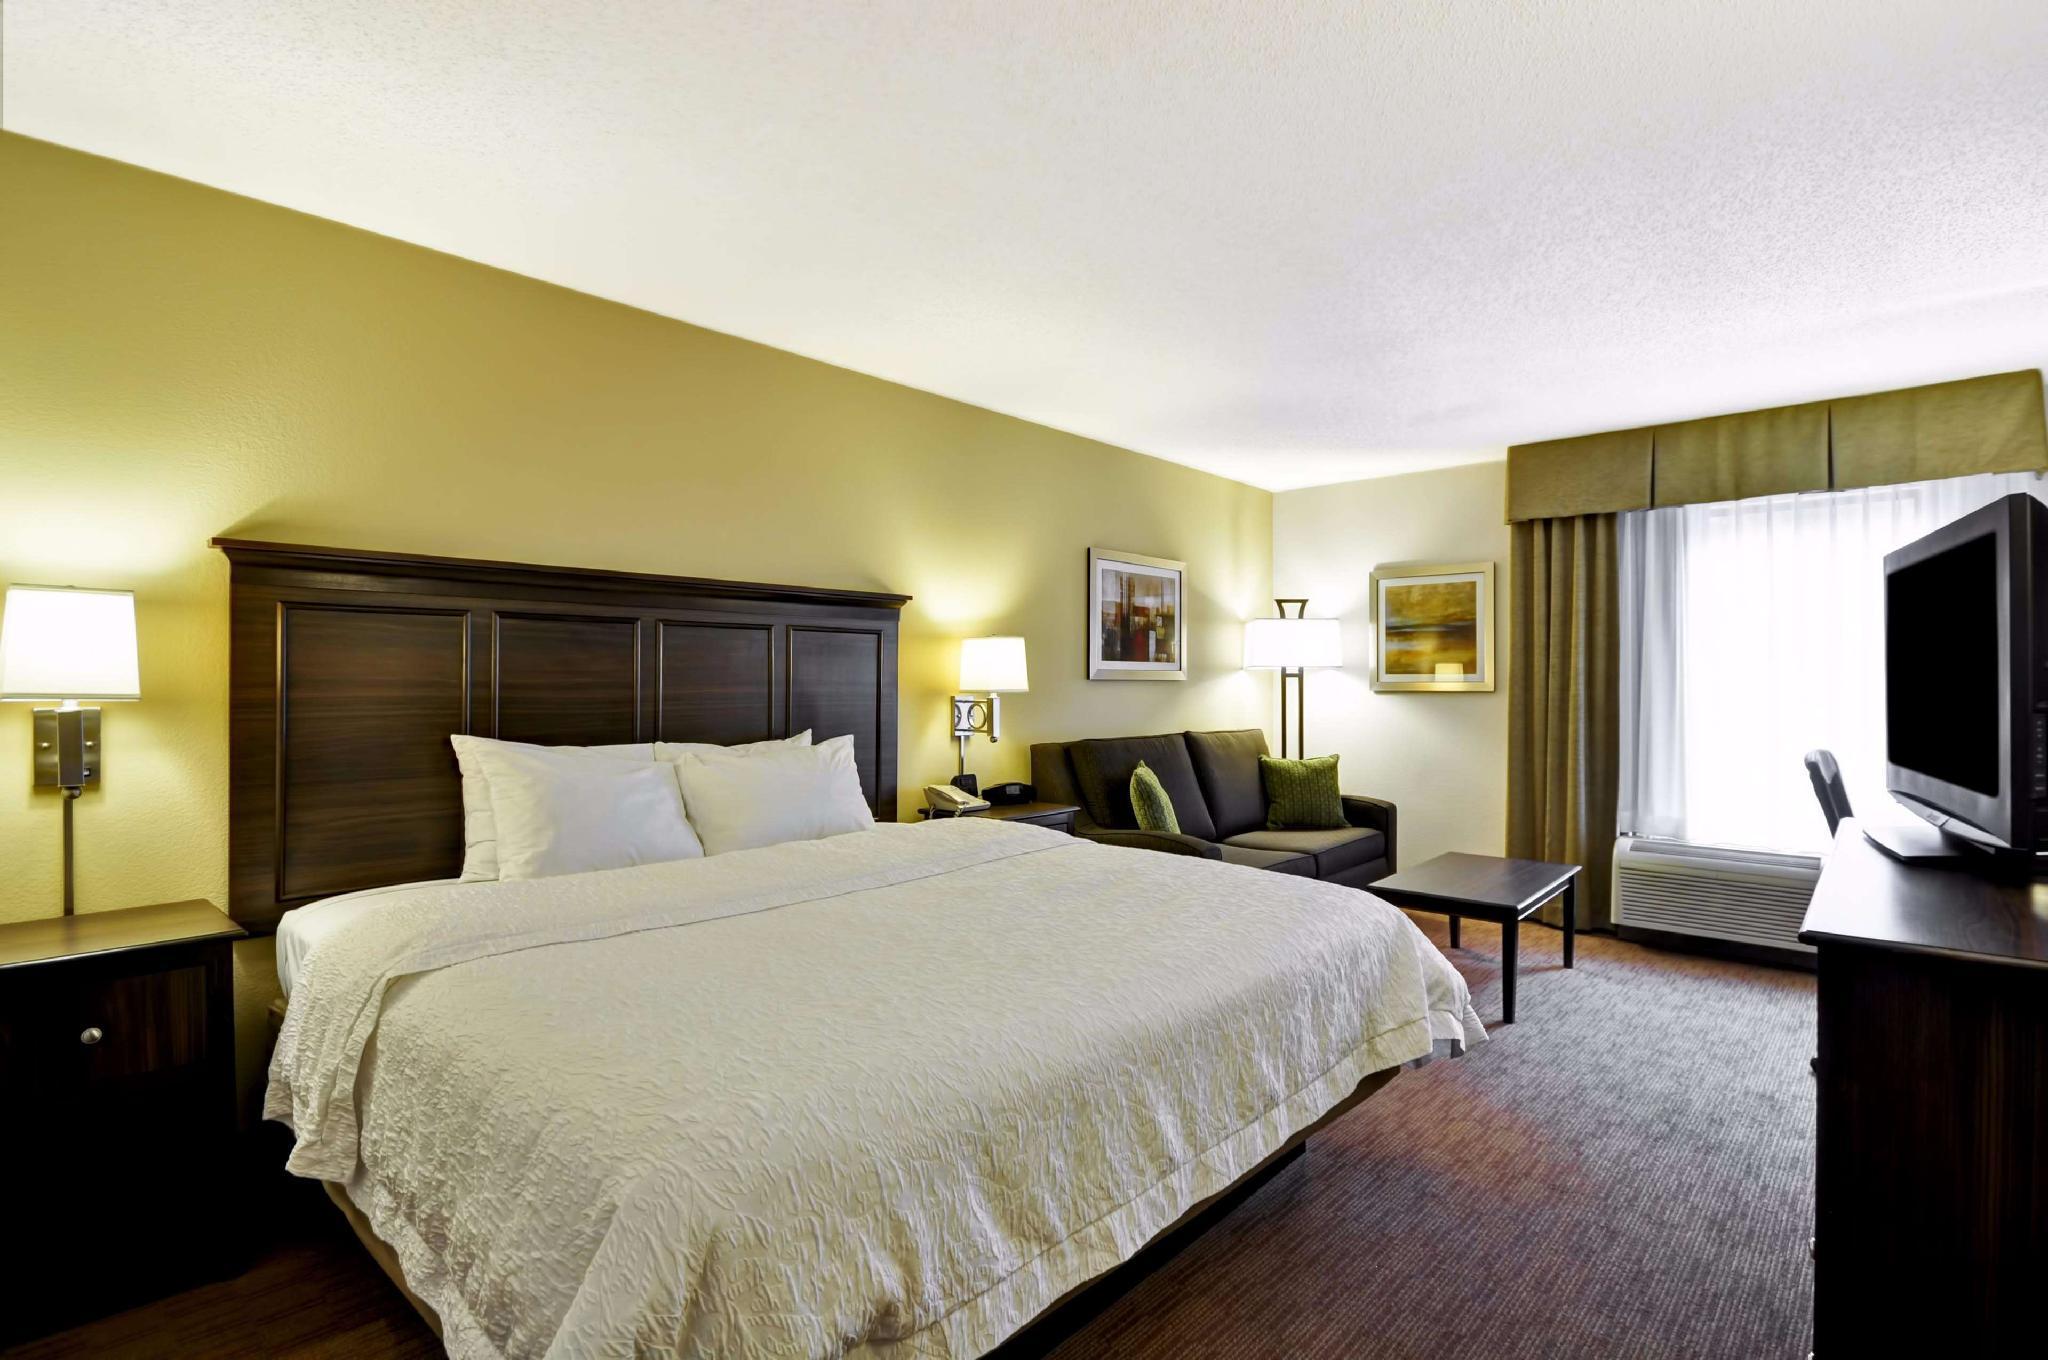 Hampton Inn Pickwick Dam Shiloh Falls Hotel Counce Tn Deals Photos Reviews